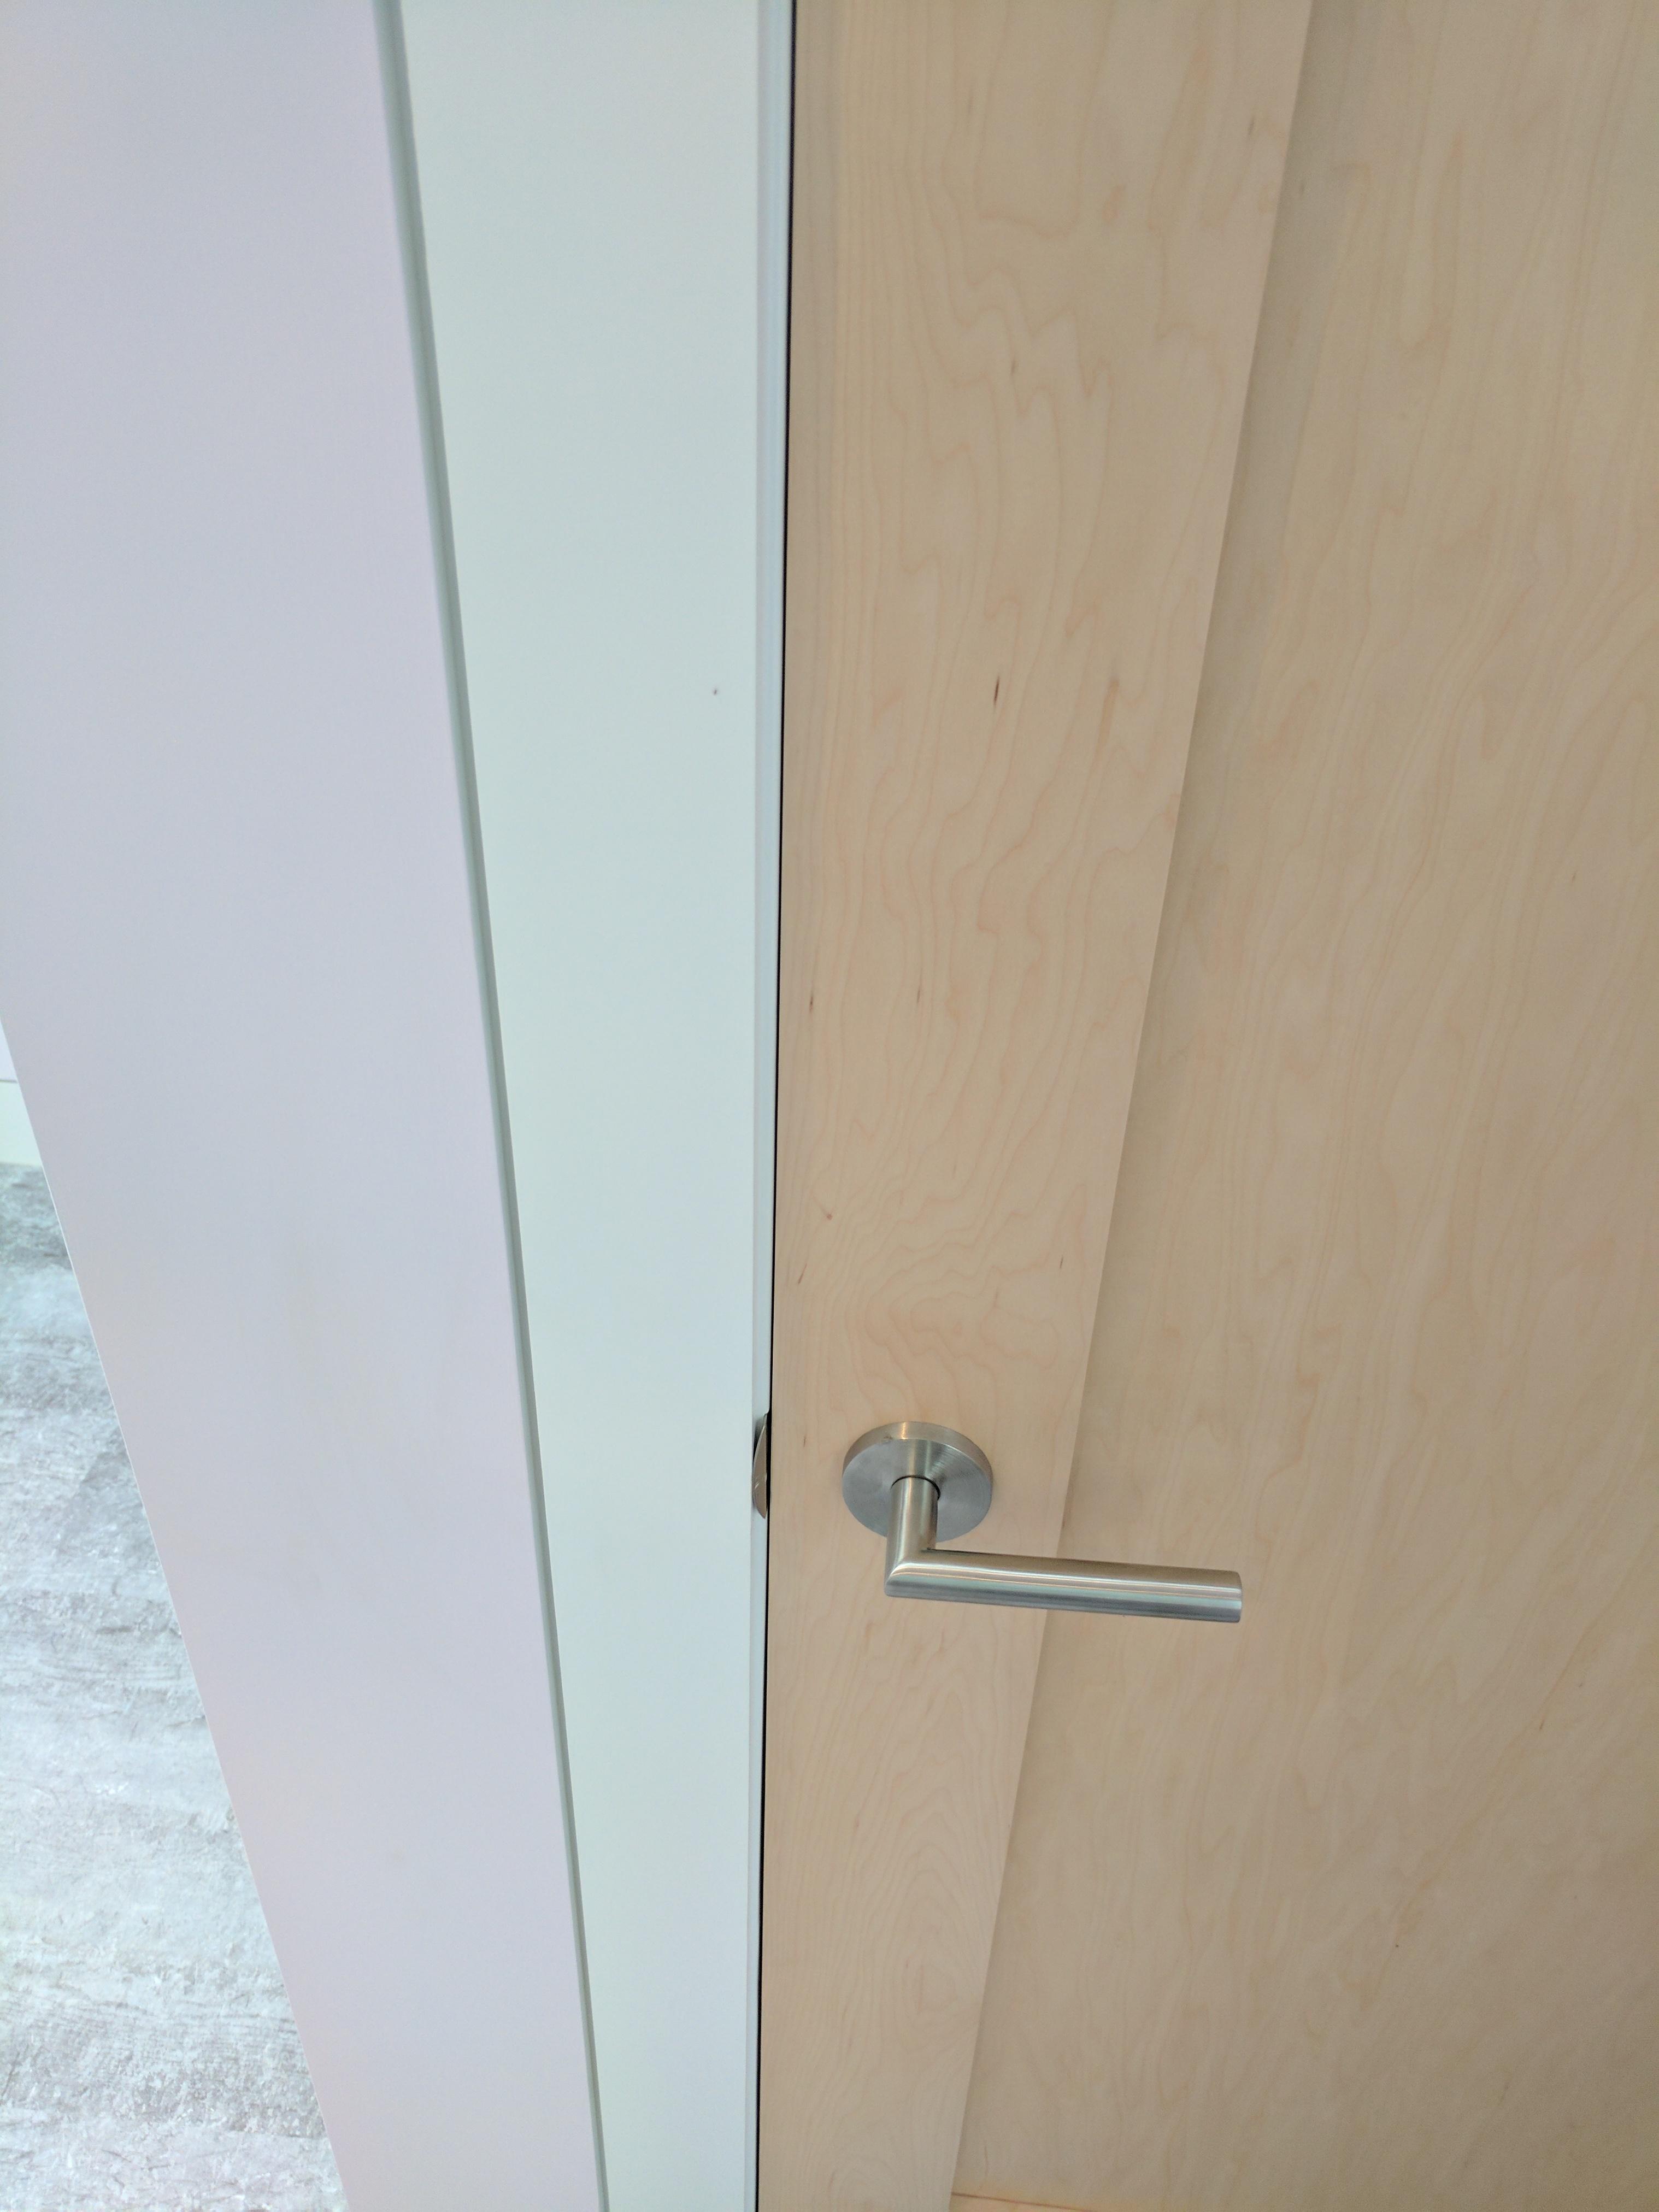 Cape Cod Custom Renovation, Flush Trim, Maple Doors, REEF Builders